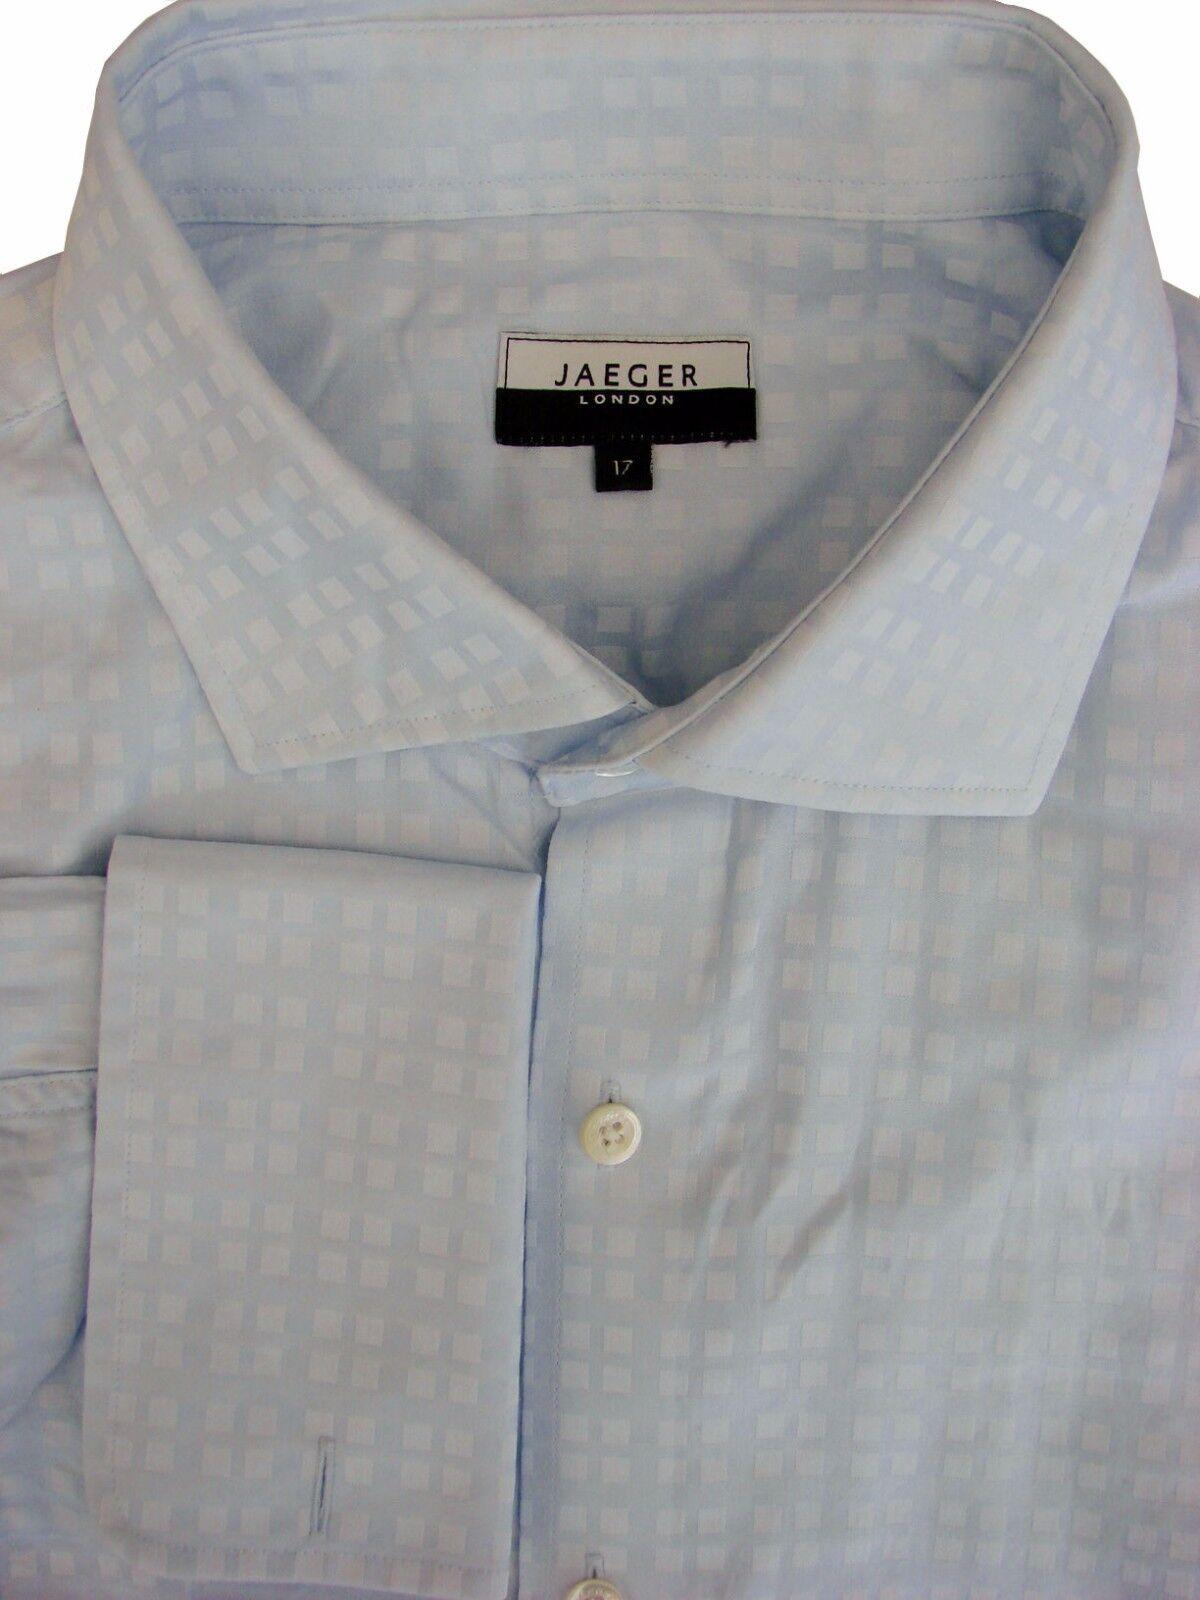 JAEGER Shirt Mens 17 L bluee – Squares – SHIMMERY